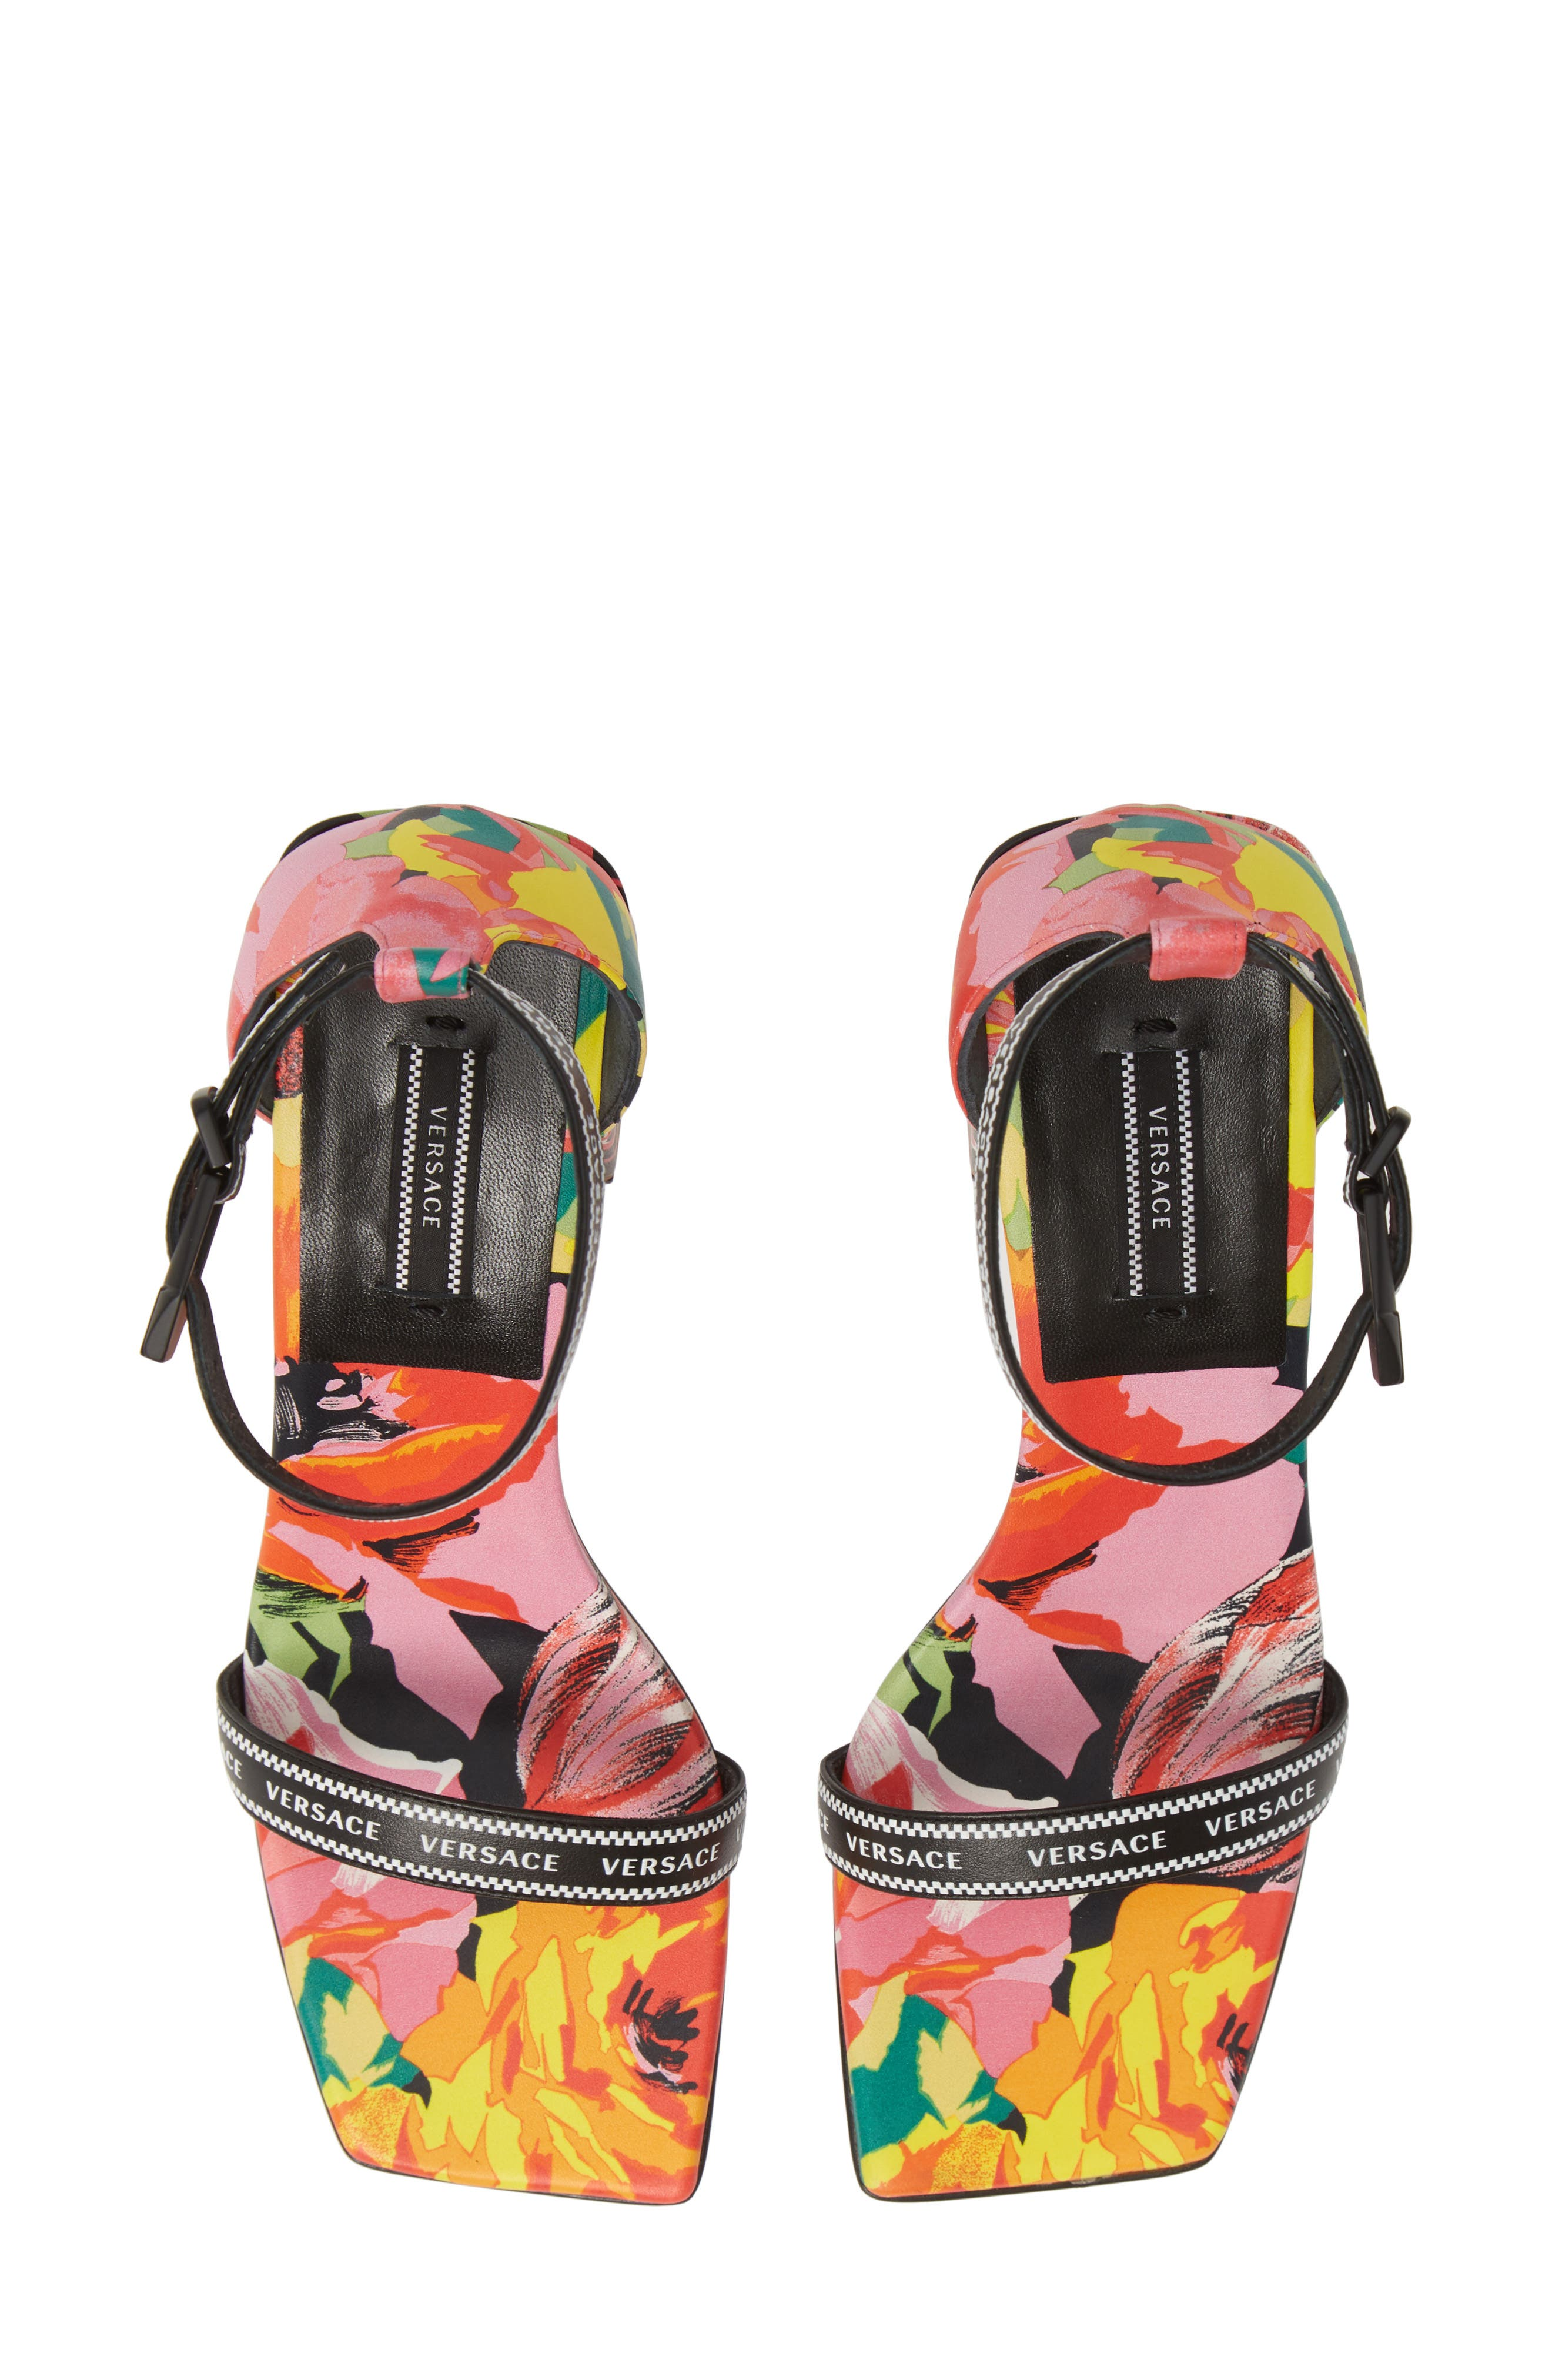 VERSACE FIRST LINE, Floral Logo Ankle Strap Sandal, Main thumbnail 1, color, BLACK PRINT